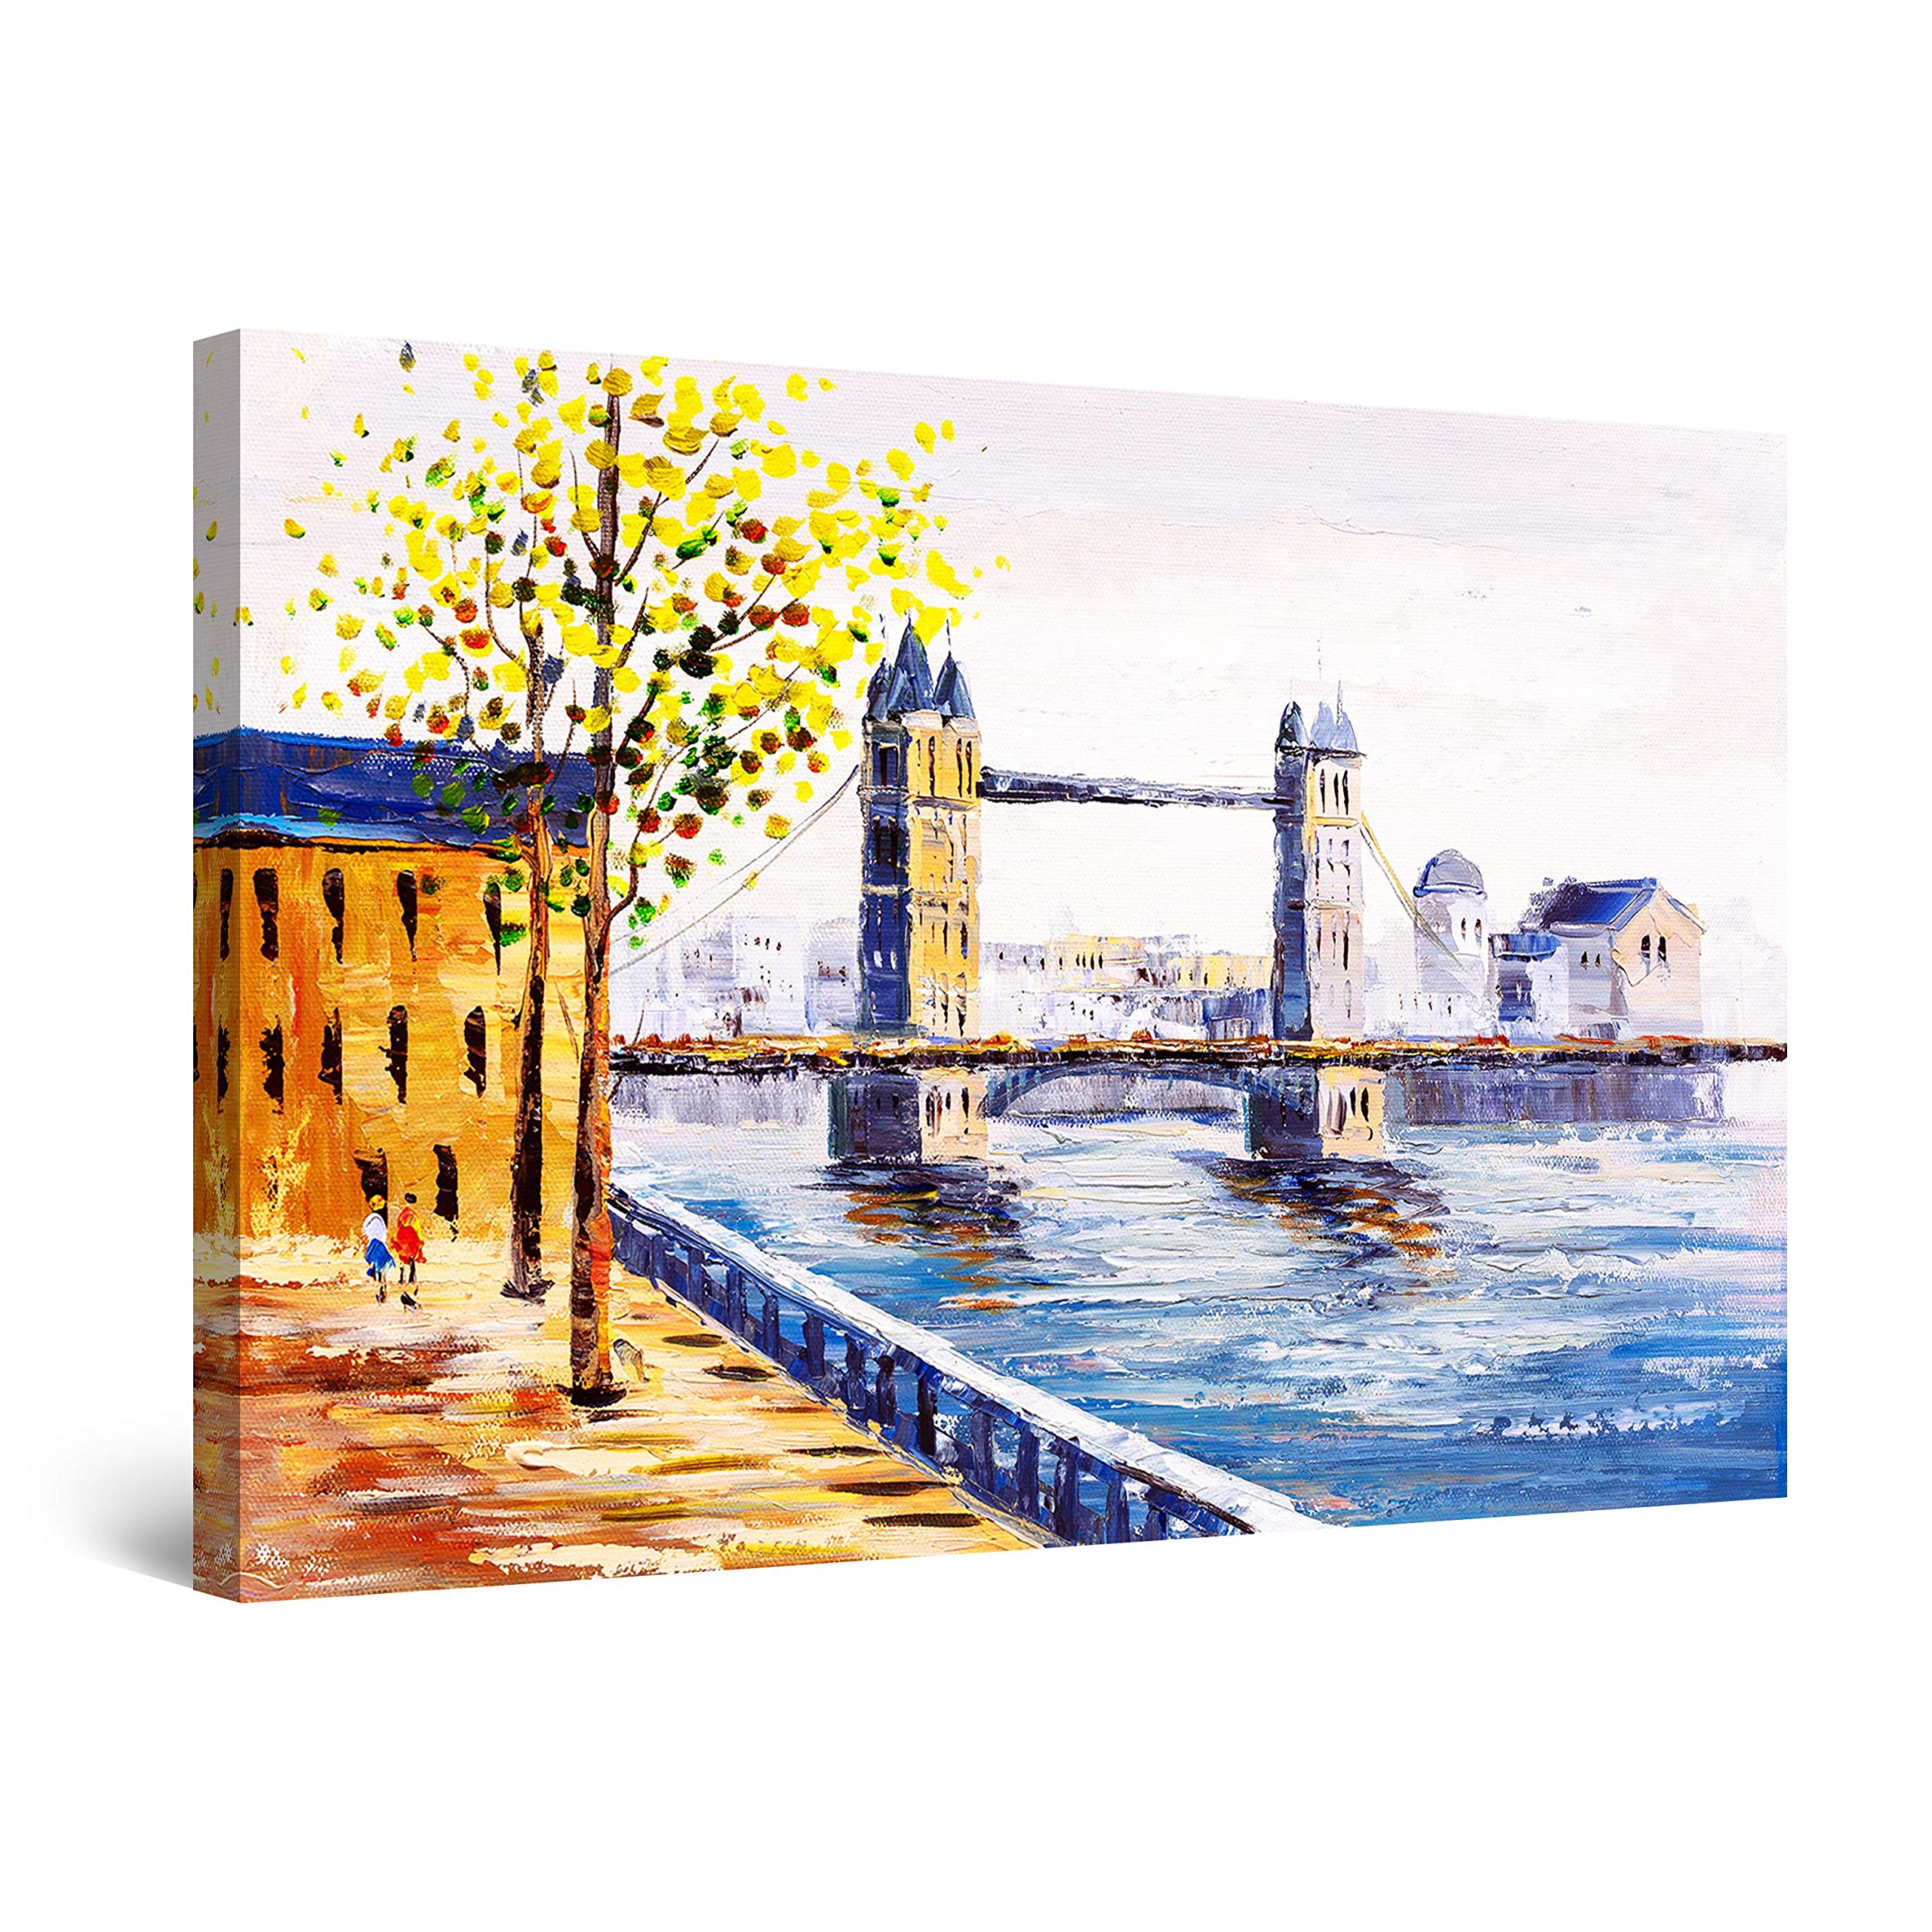 "Startonight Canvas Wall Art Abstract - Tower Bridge London UK Painting - Large Artwork Print for Living Room 32"" x 48"""